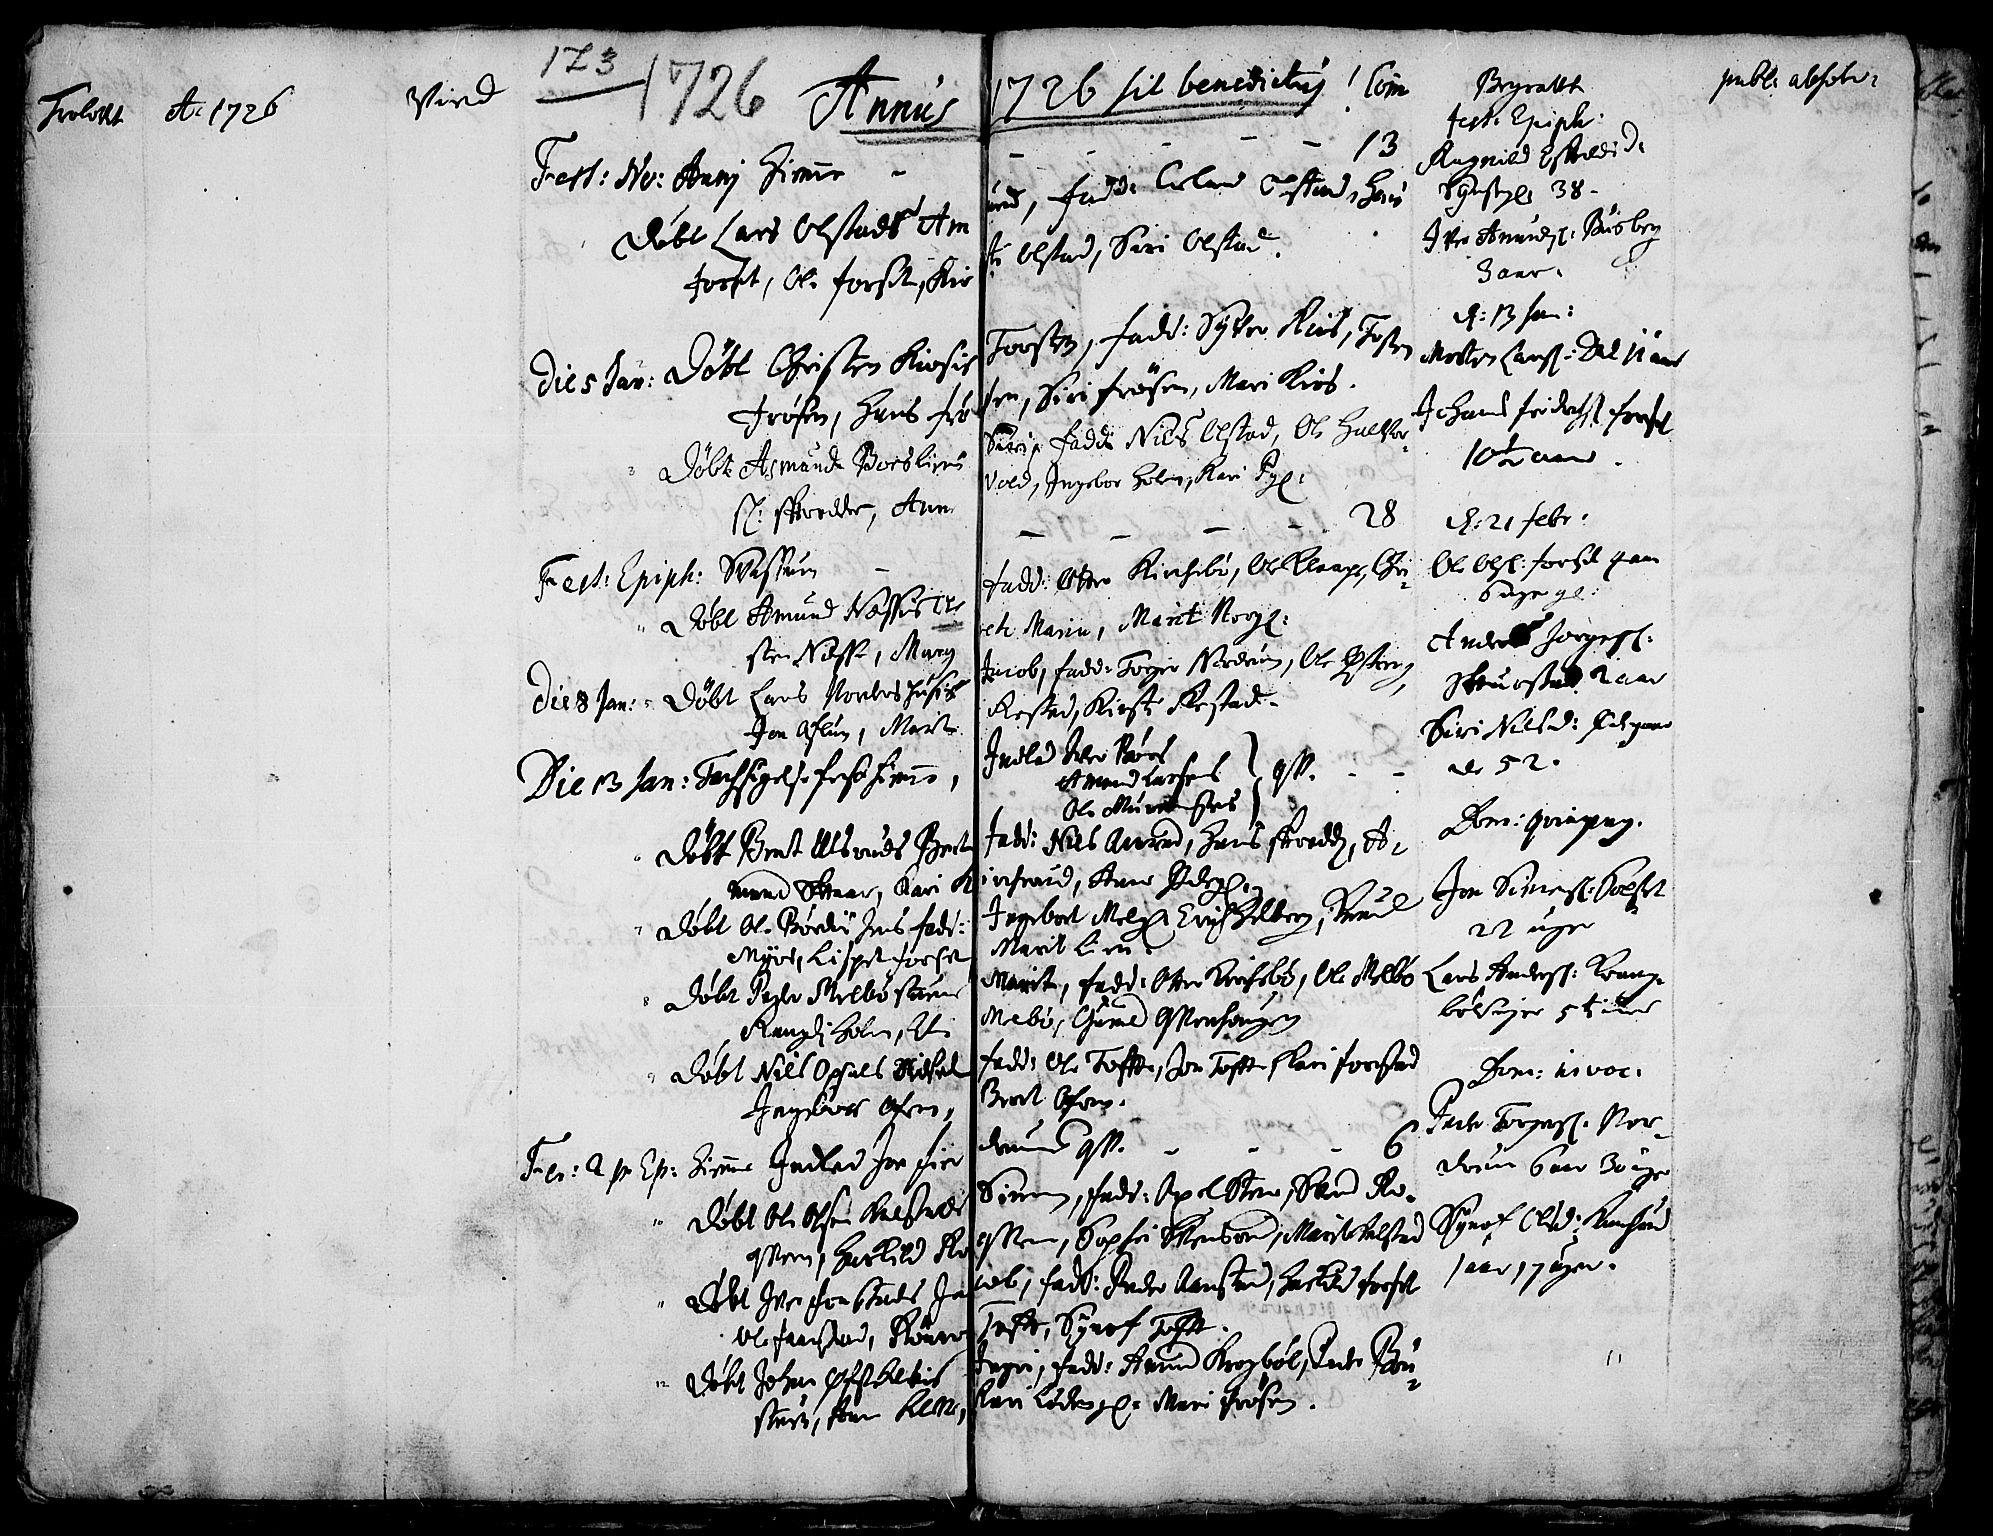 SAH, Gausdal prestekontor, Ministerialbok nr. 1, 1693-1728, s. 173